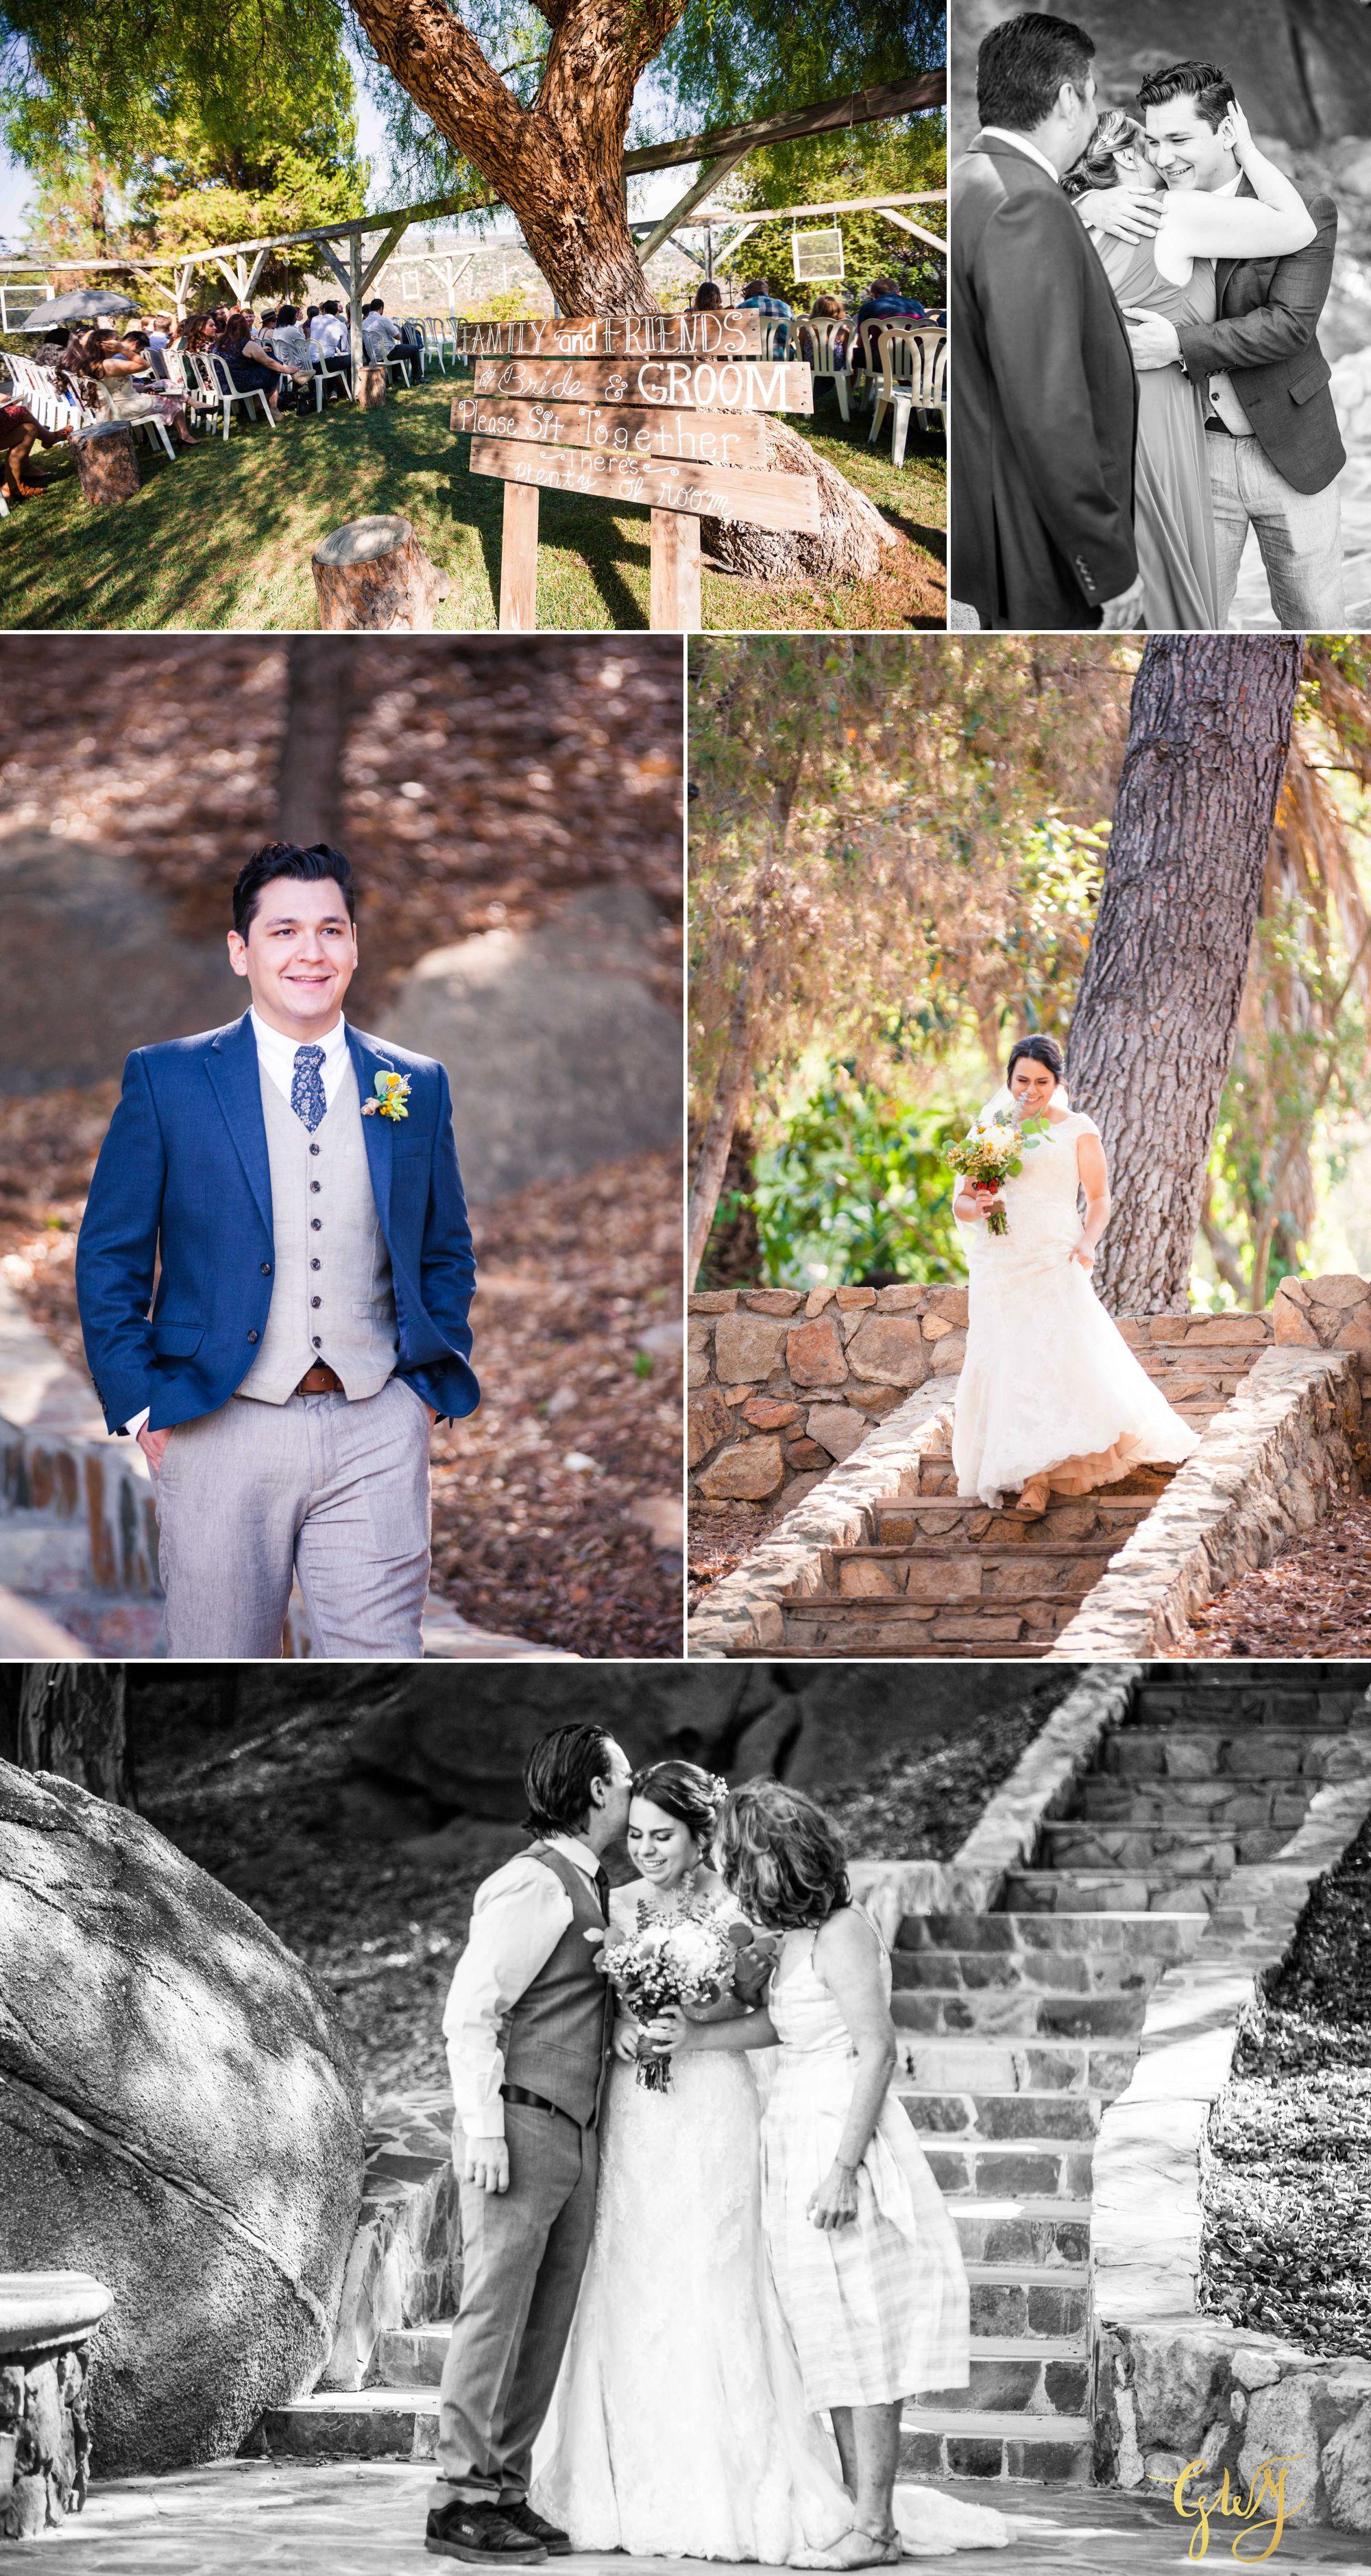 Hannah + Lorenzo Secluded Garden Estate Temecula DIY Wedding by Glass Woods Media 13.jpg